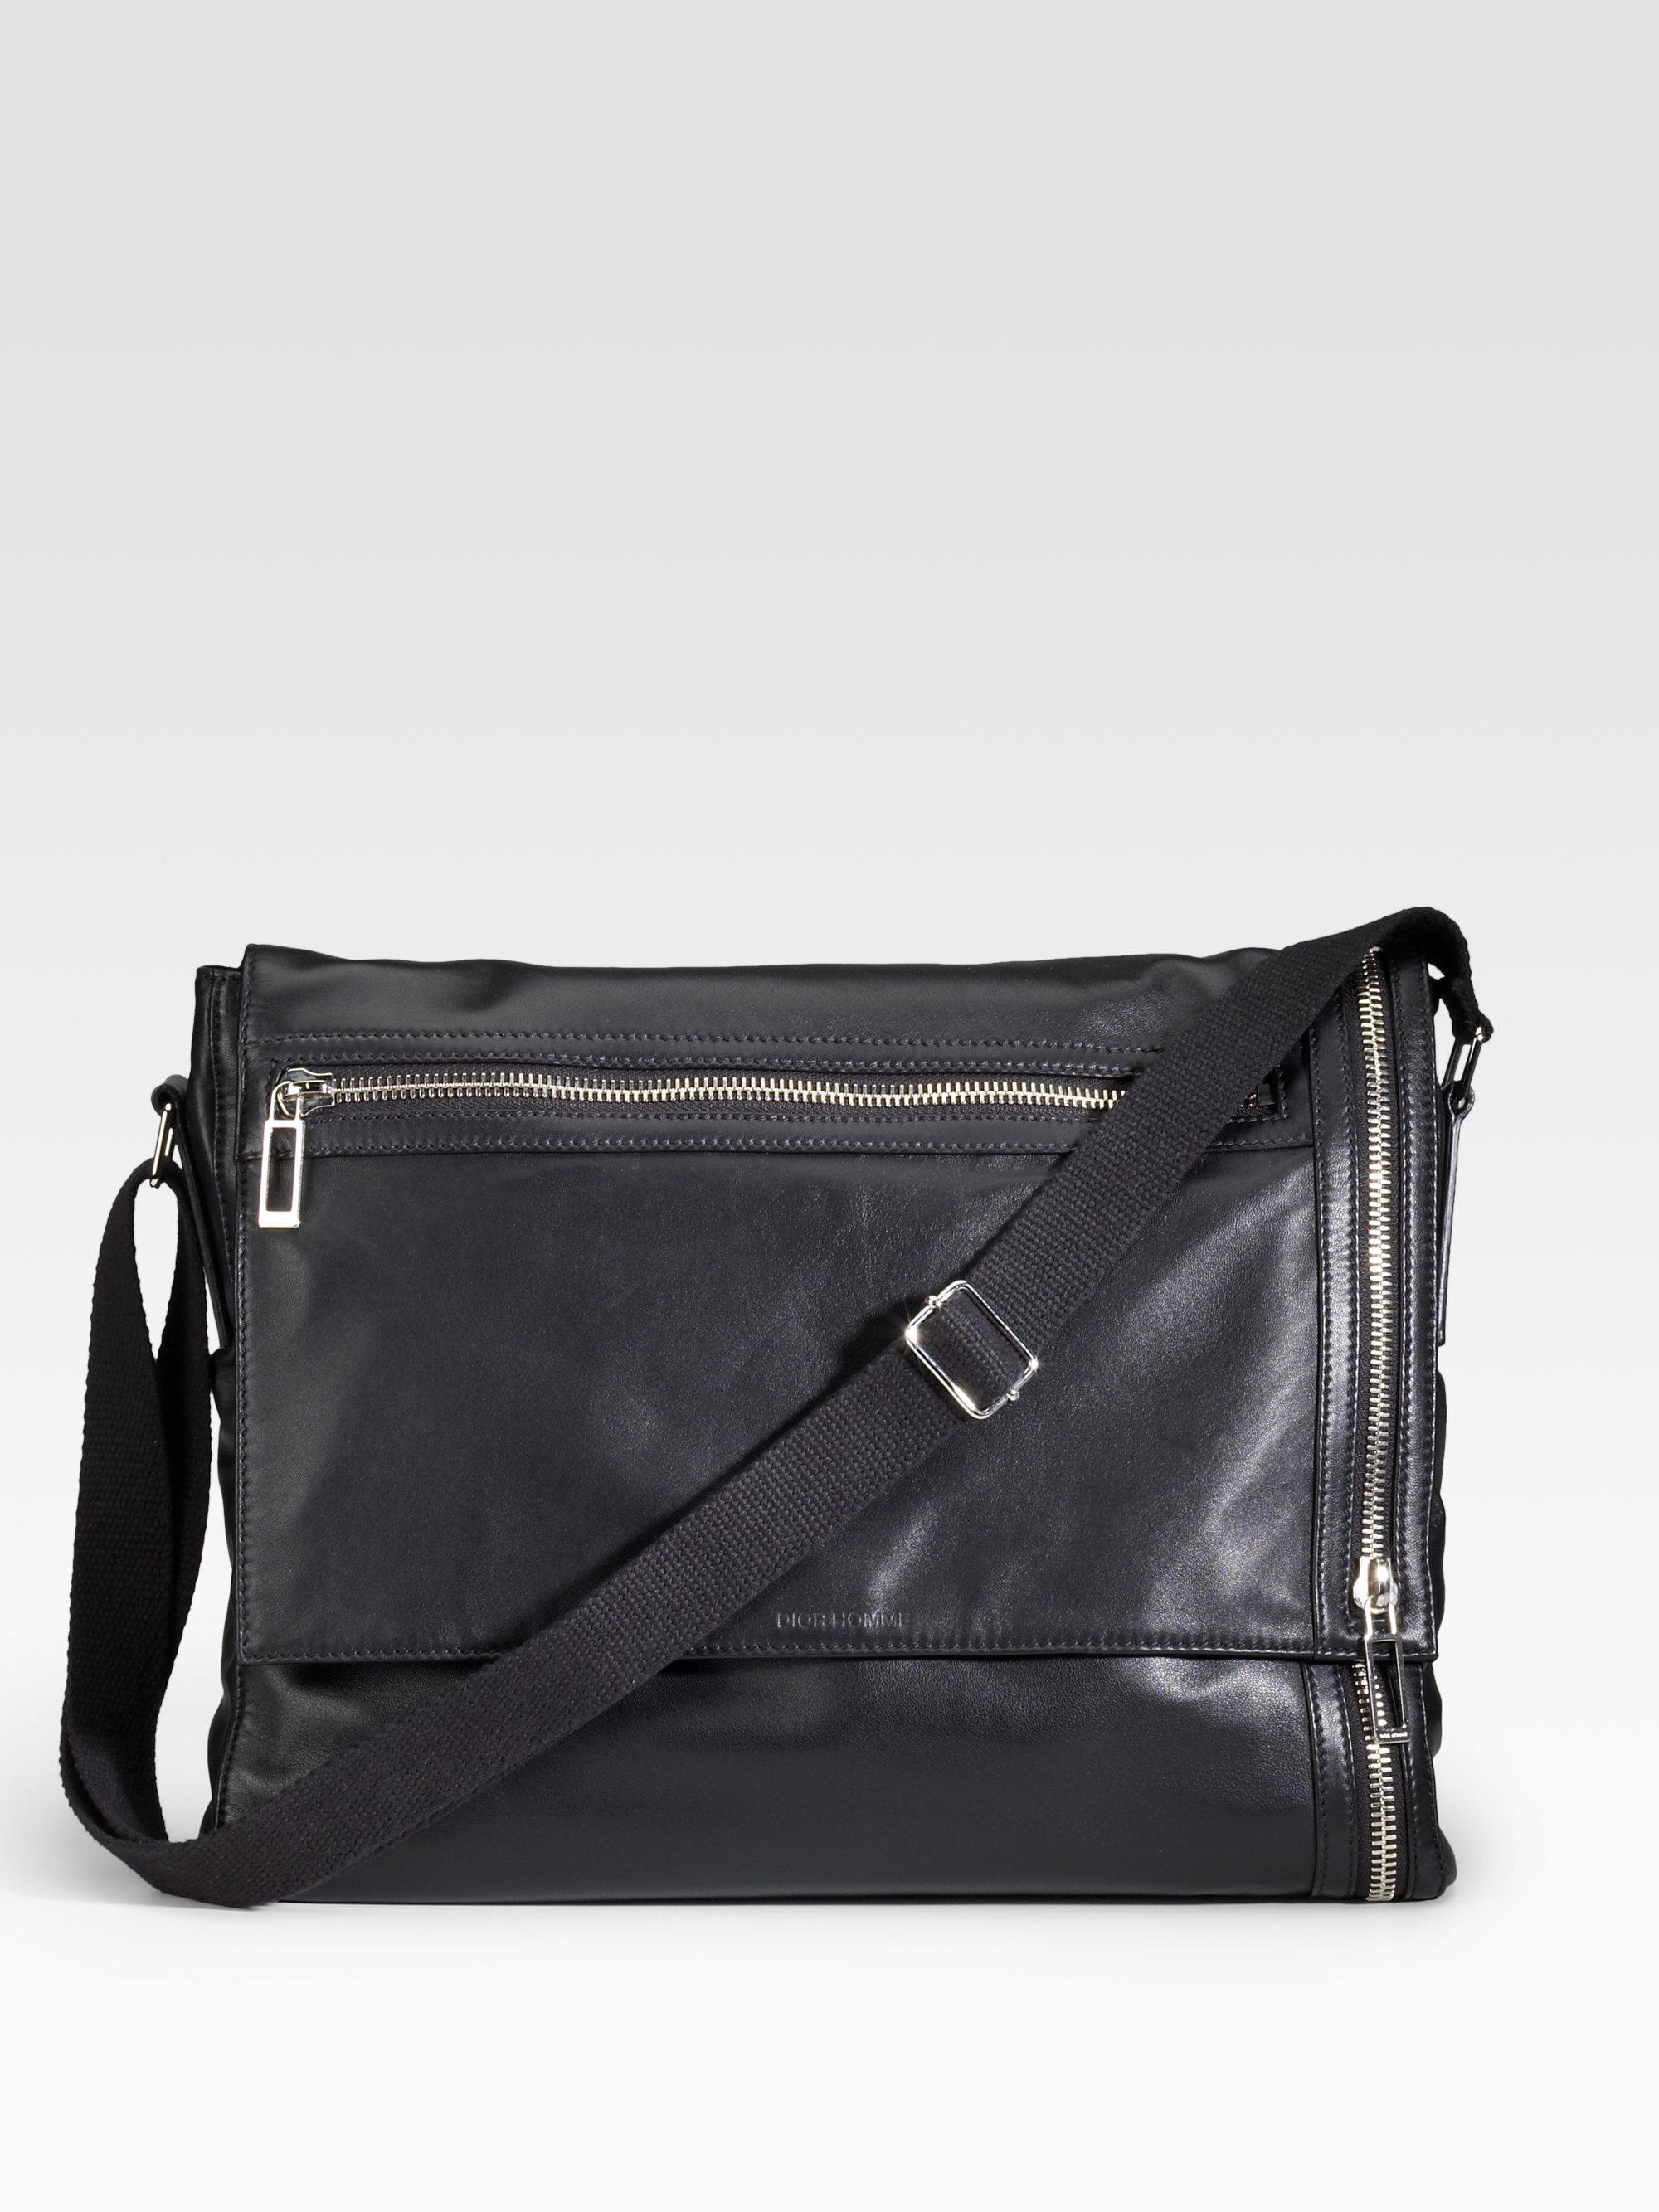 Lyst - Dior Homme Nappa Leather Messenger Bag in Black for Men 4311f96cbcf16